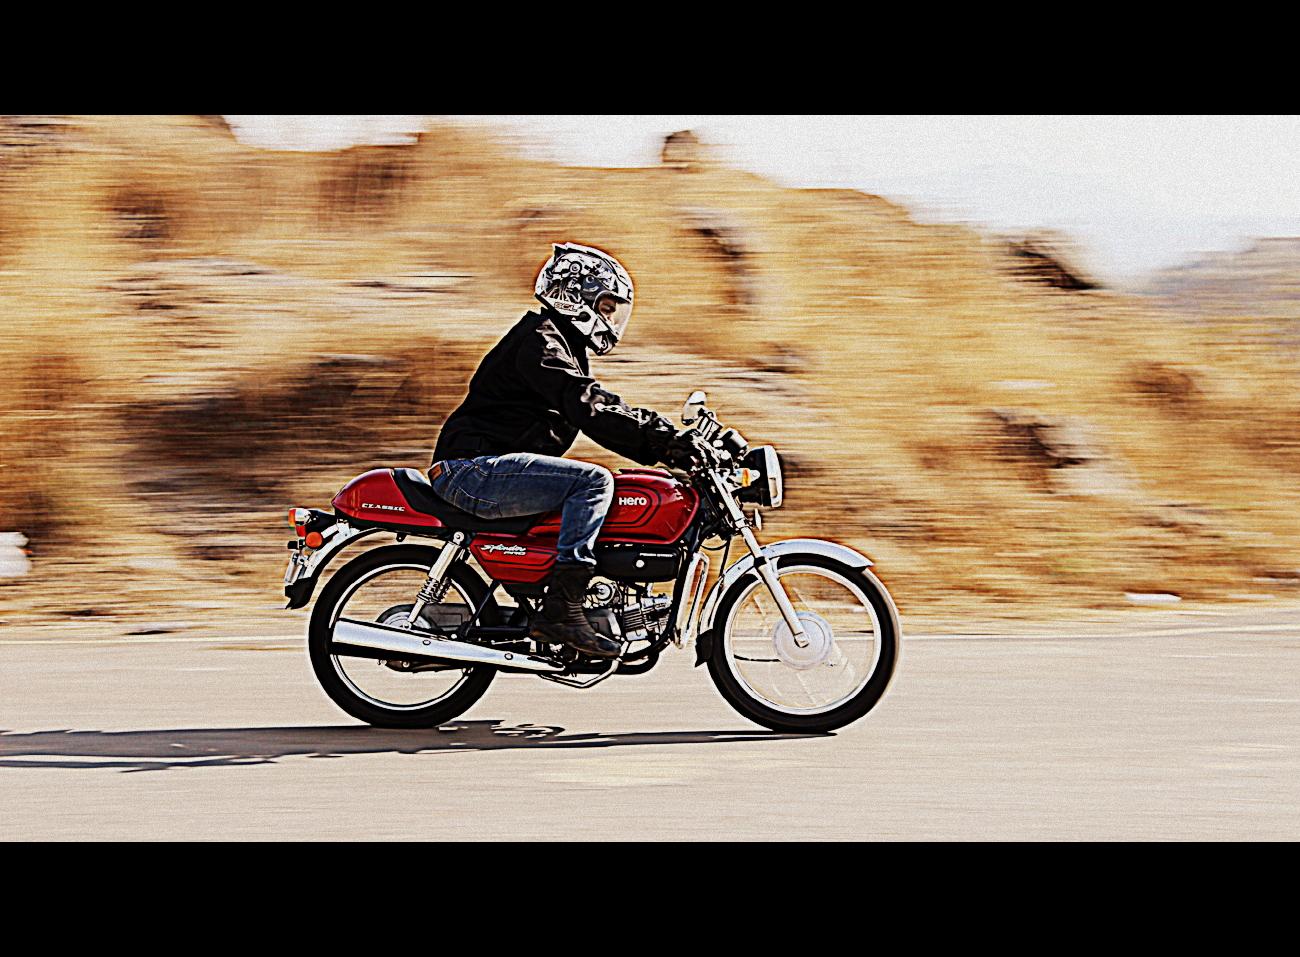 hero-motocorp-splendor-pro-classic-02.jpg